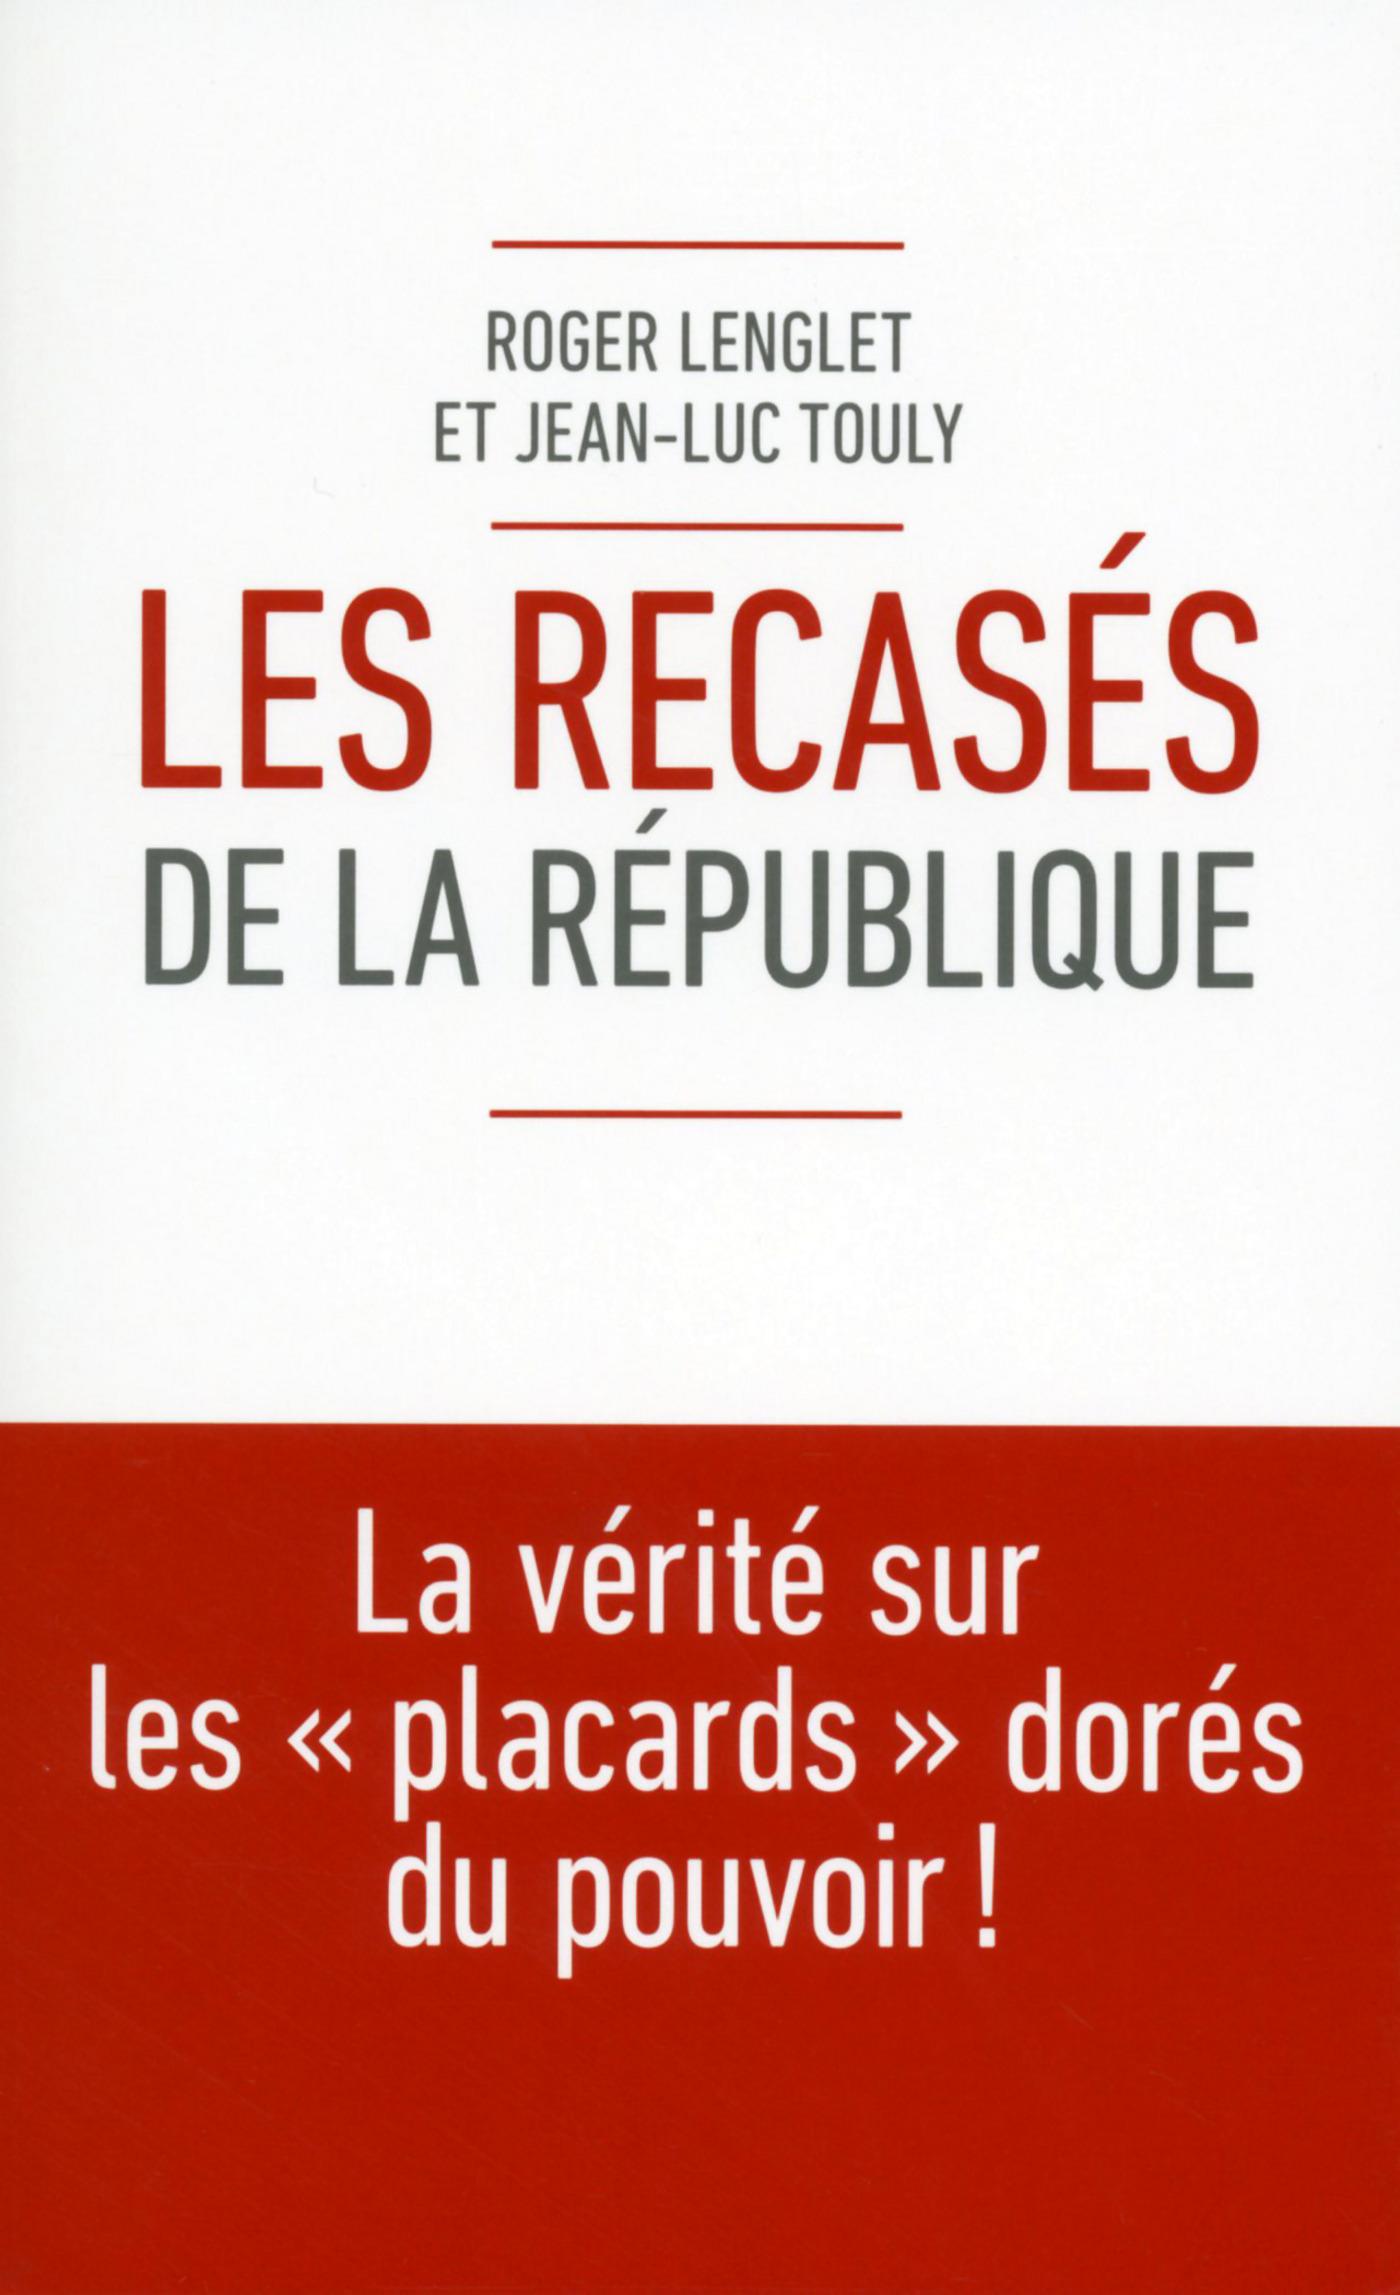 Les recasés de la République (ebook)